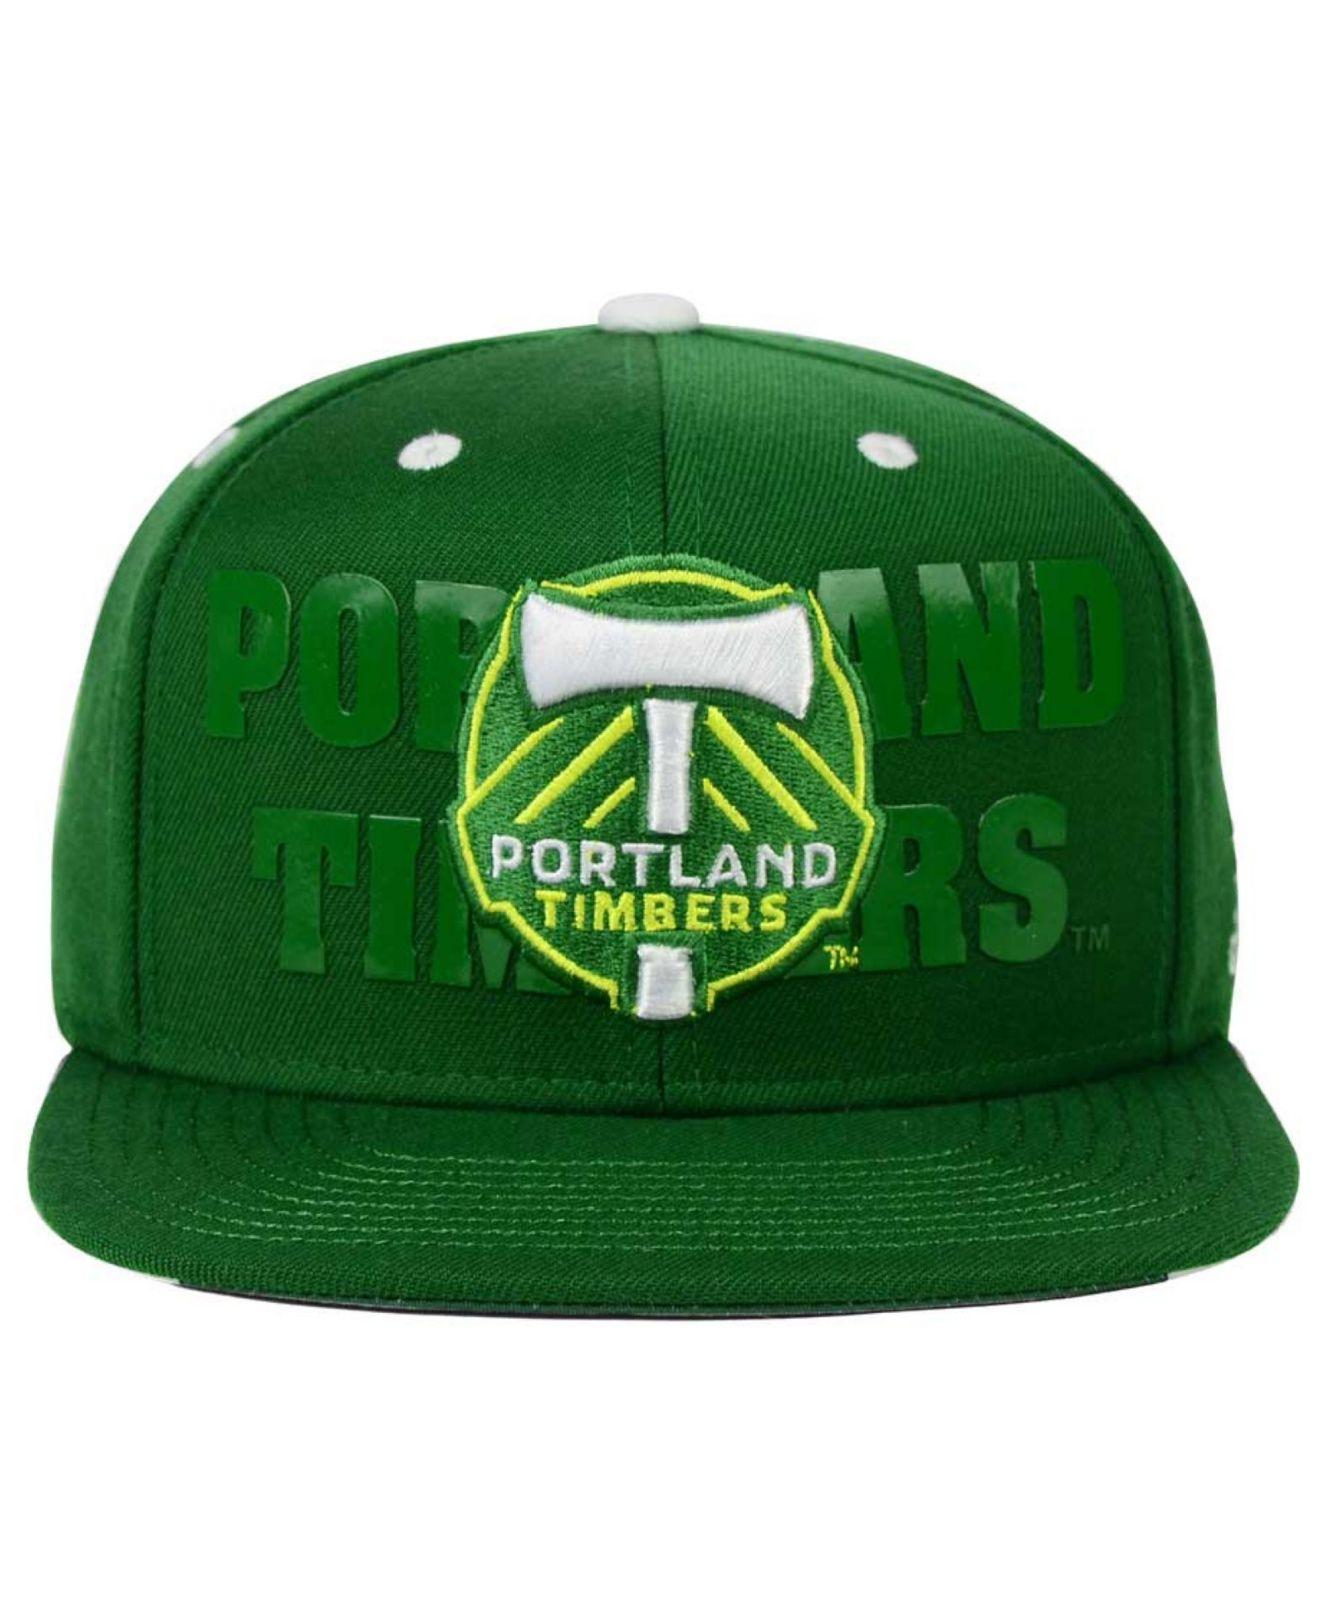 5b2e82f031f Lyst - adidas Originals Portland Timbers Academy Snapback Cap in ...